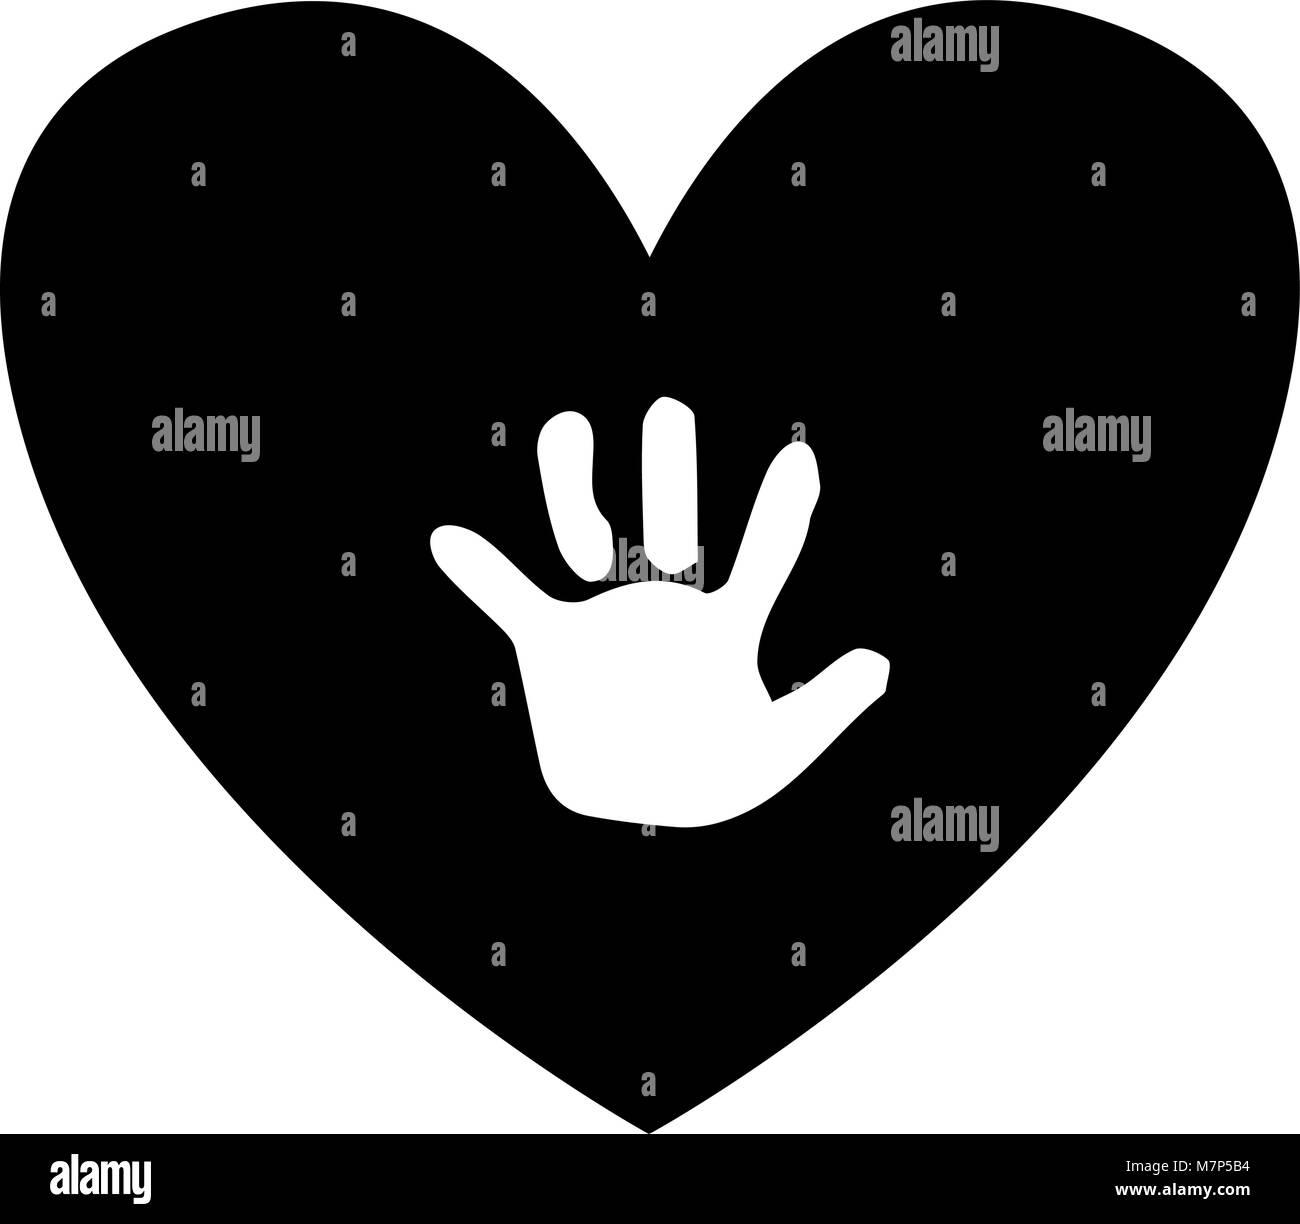 Baby handprint inside of black heart isolated on white background. Black and white vector illustration, logo, icon. - Stock Vector